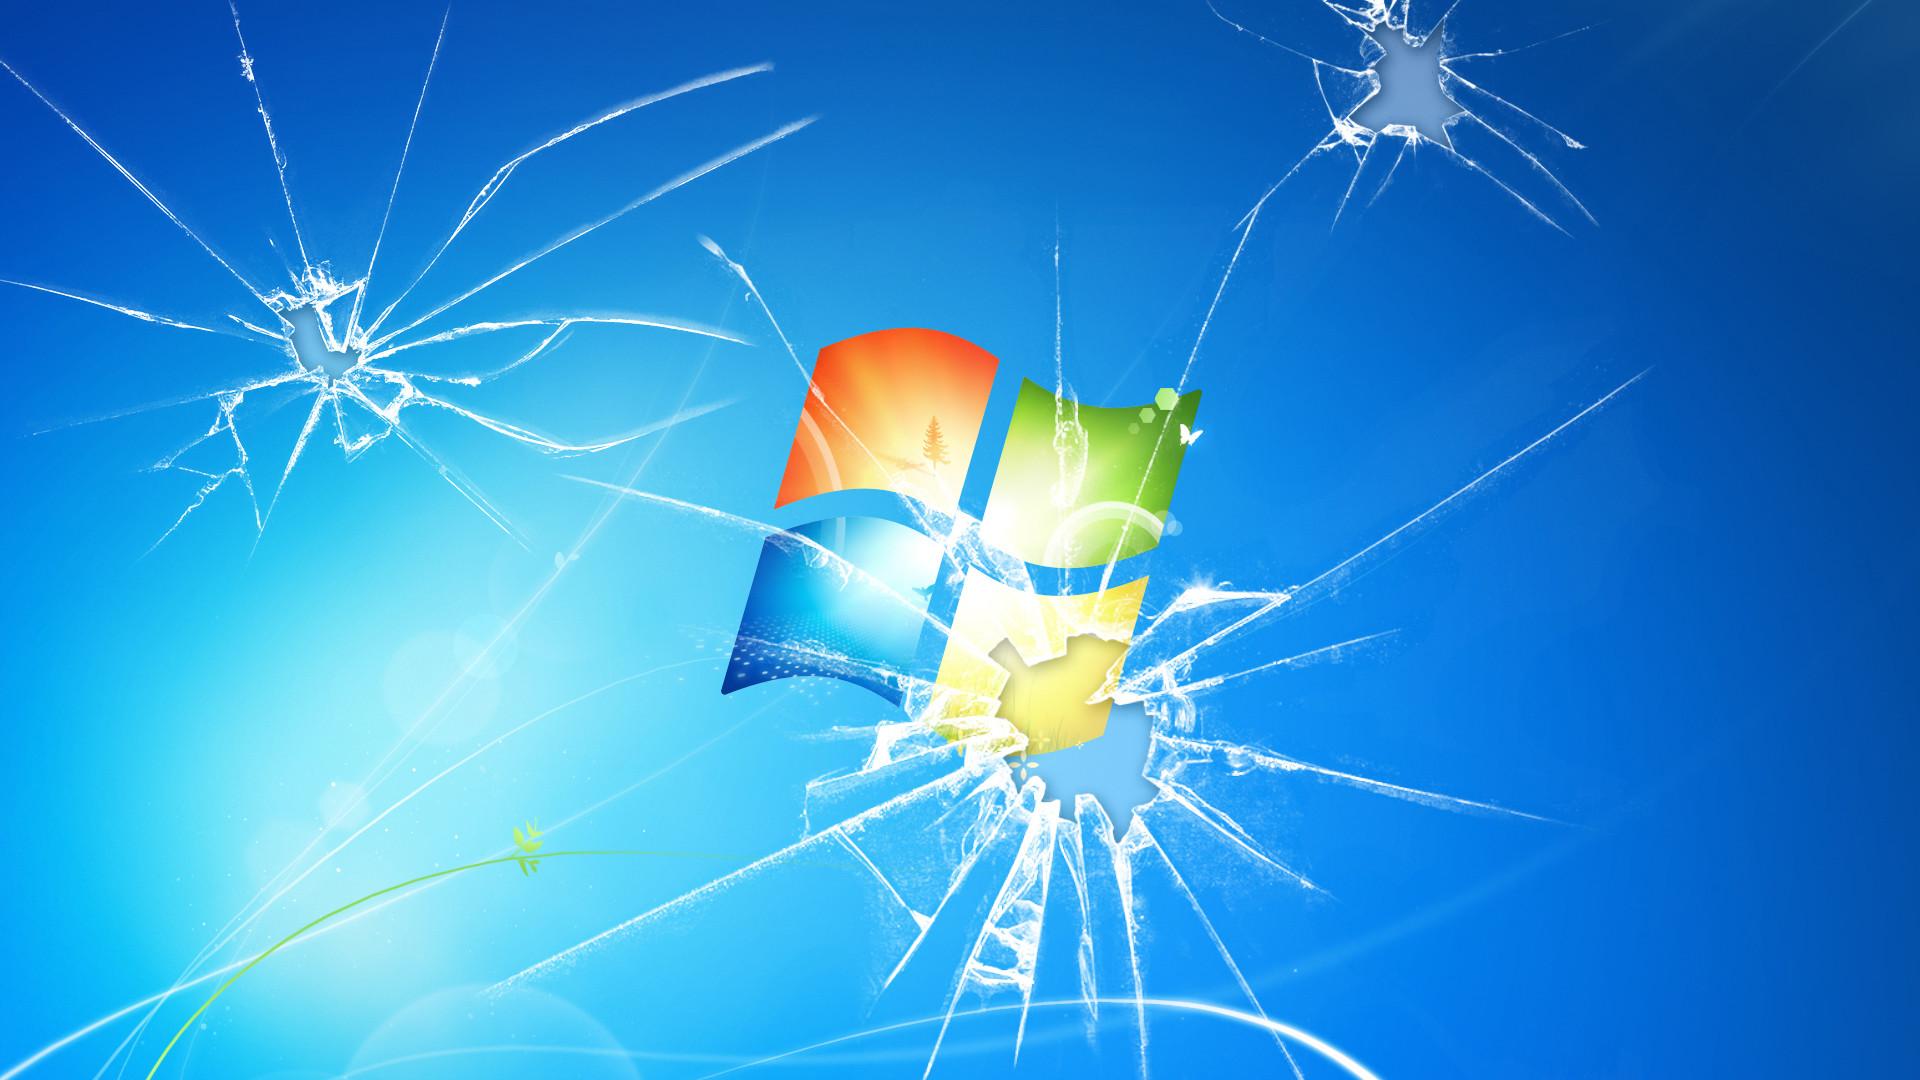 Download Broken Glass Windows Wallpaper   Free Wallpapers